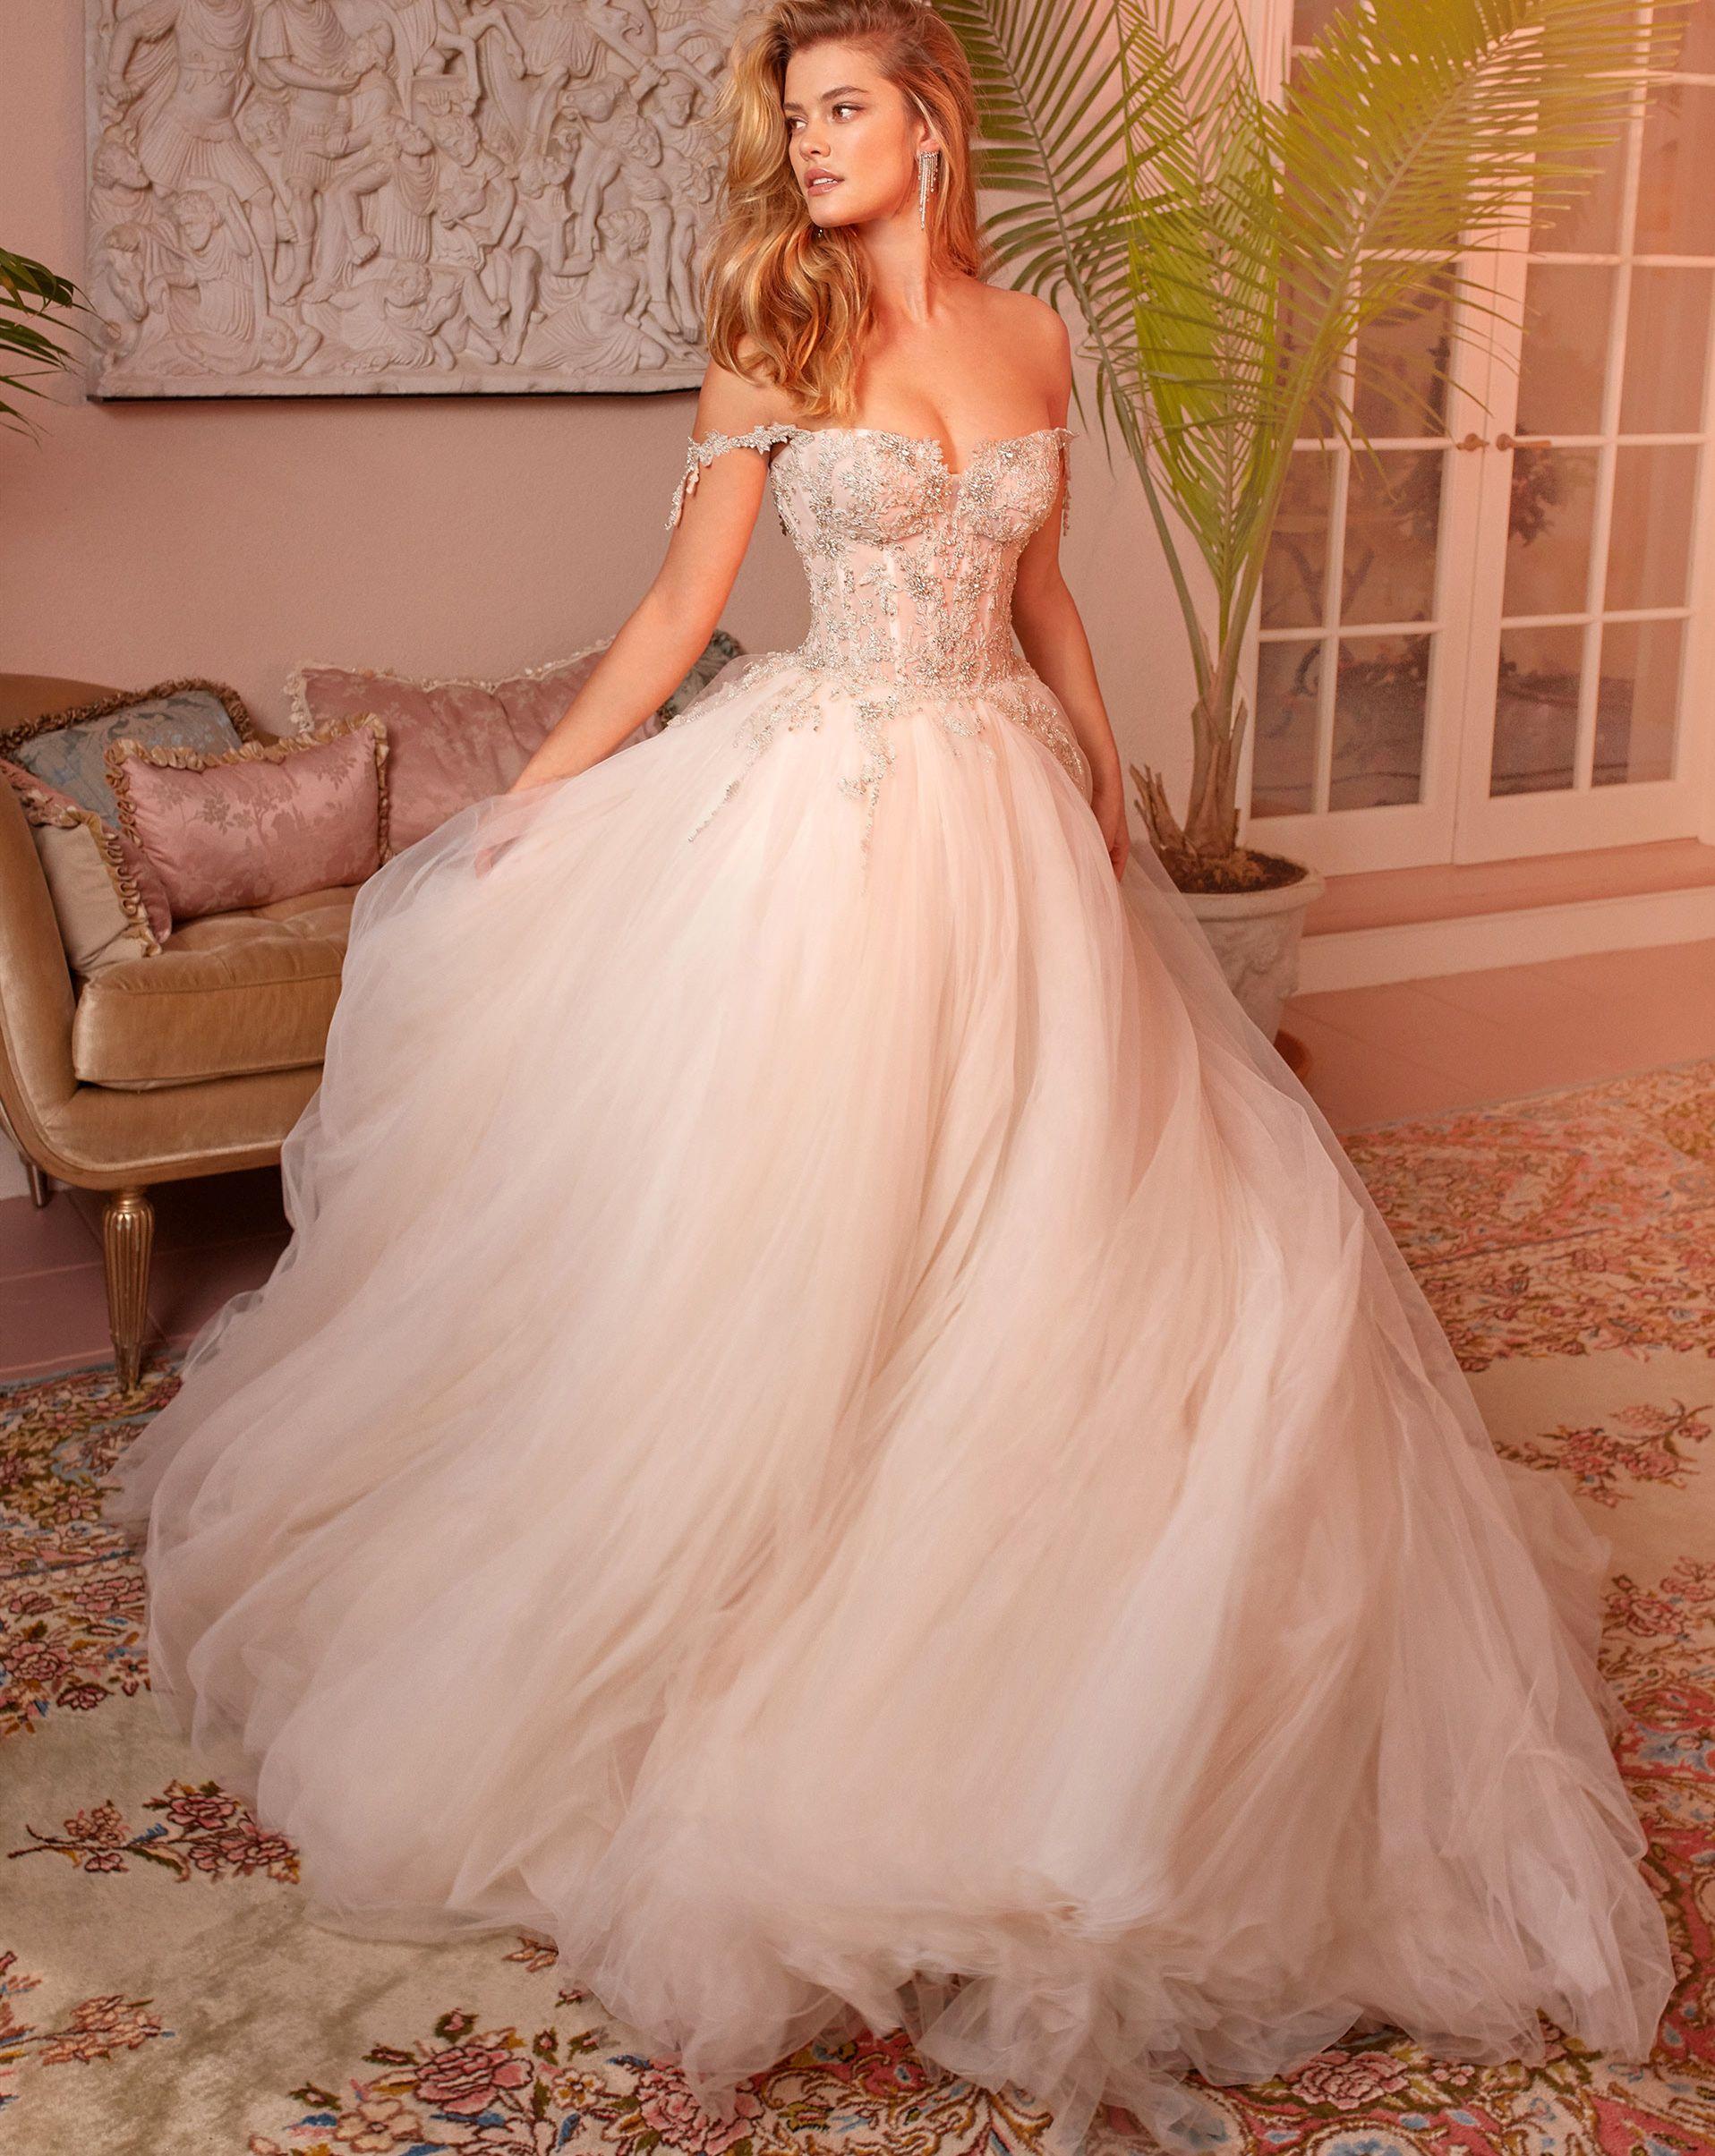 625438f7676d Vestidos De Noiva Tradicional Fora Do Ombro Espartilho Vestidos De Casamento  Vestido De Novia Frisada Lace Vestido De Casamento Vestidos De Noiva De Tule  ...